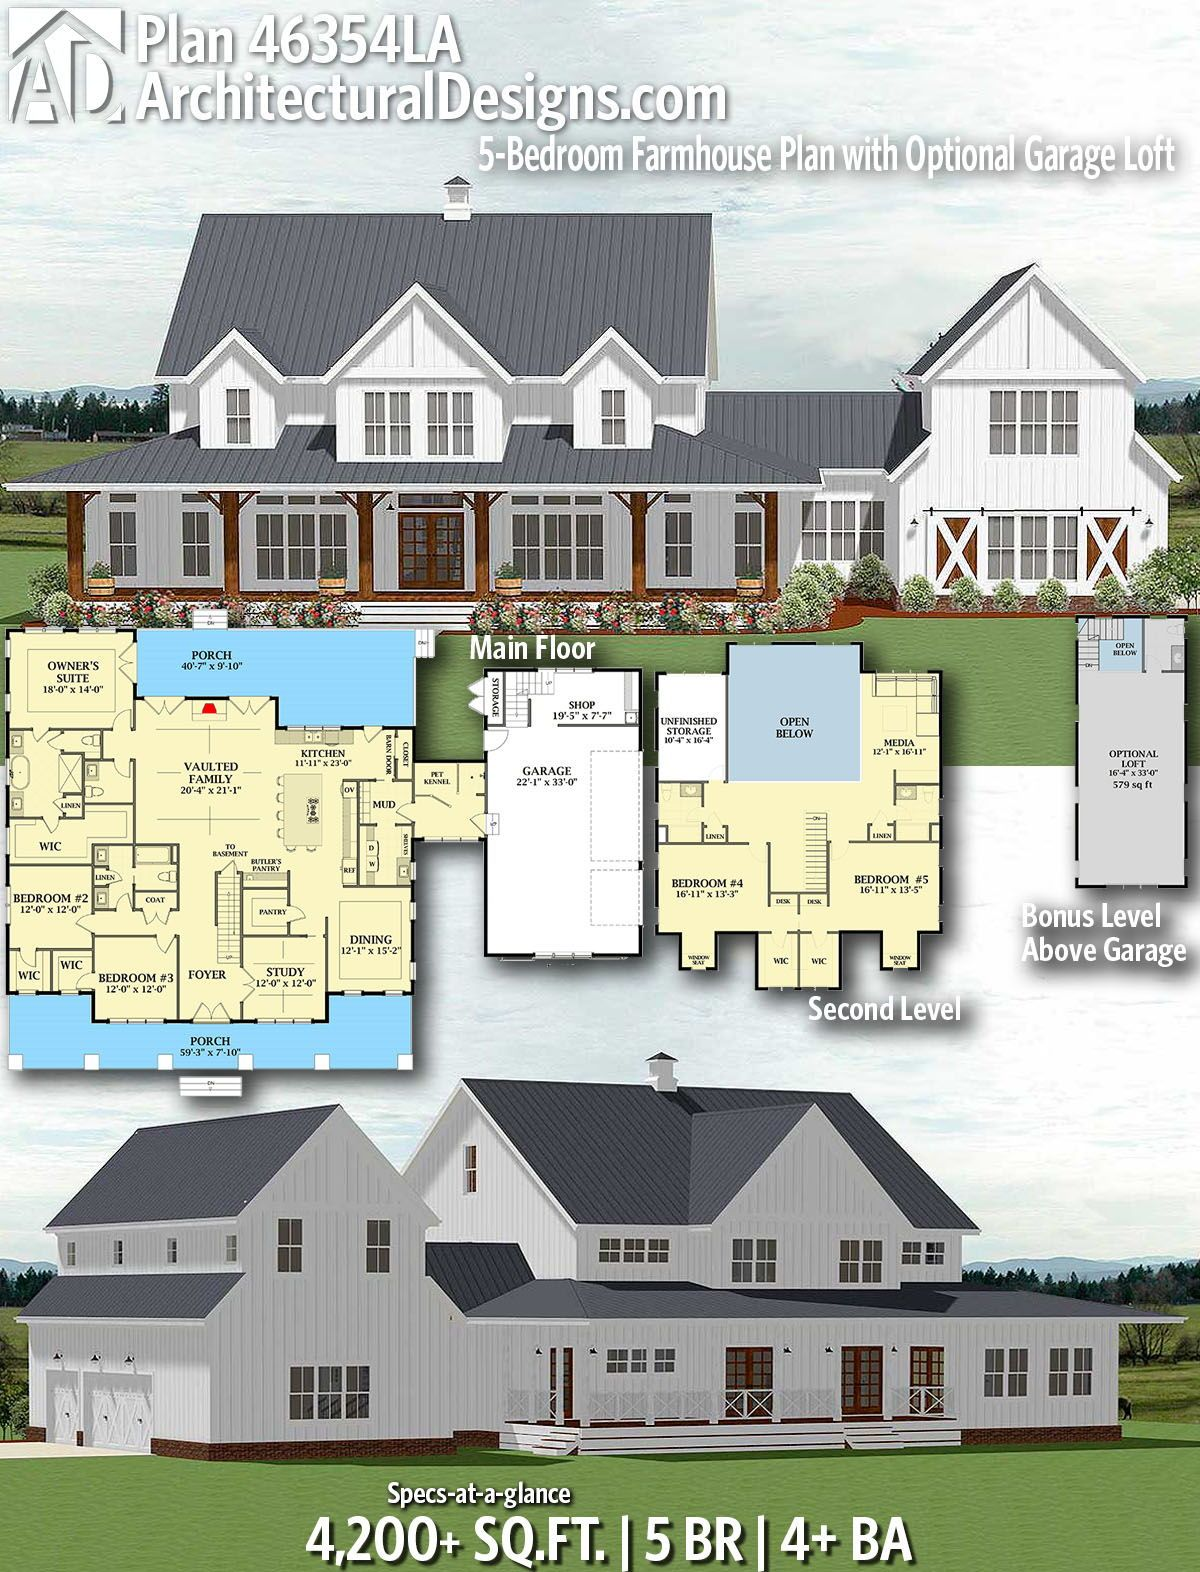 Plan 46354la 5 Bedroom Farmhouse Plan With Optional Garage Loft House Plans Farmhouse Farmhouse Plans Modern Farmhouse Plans